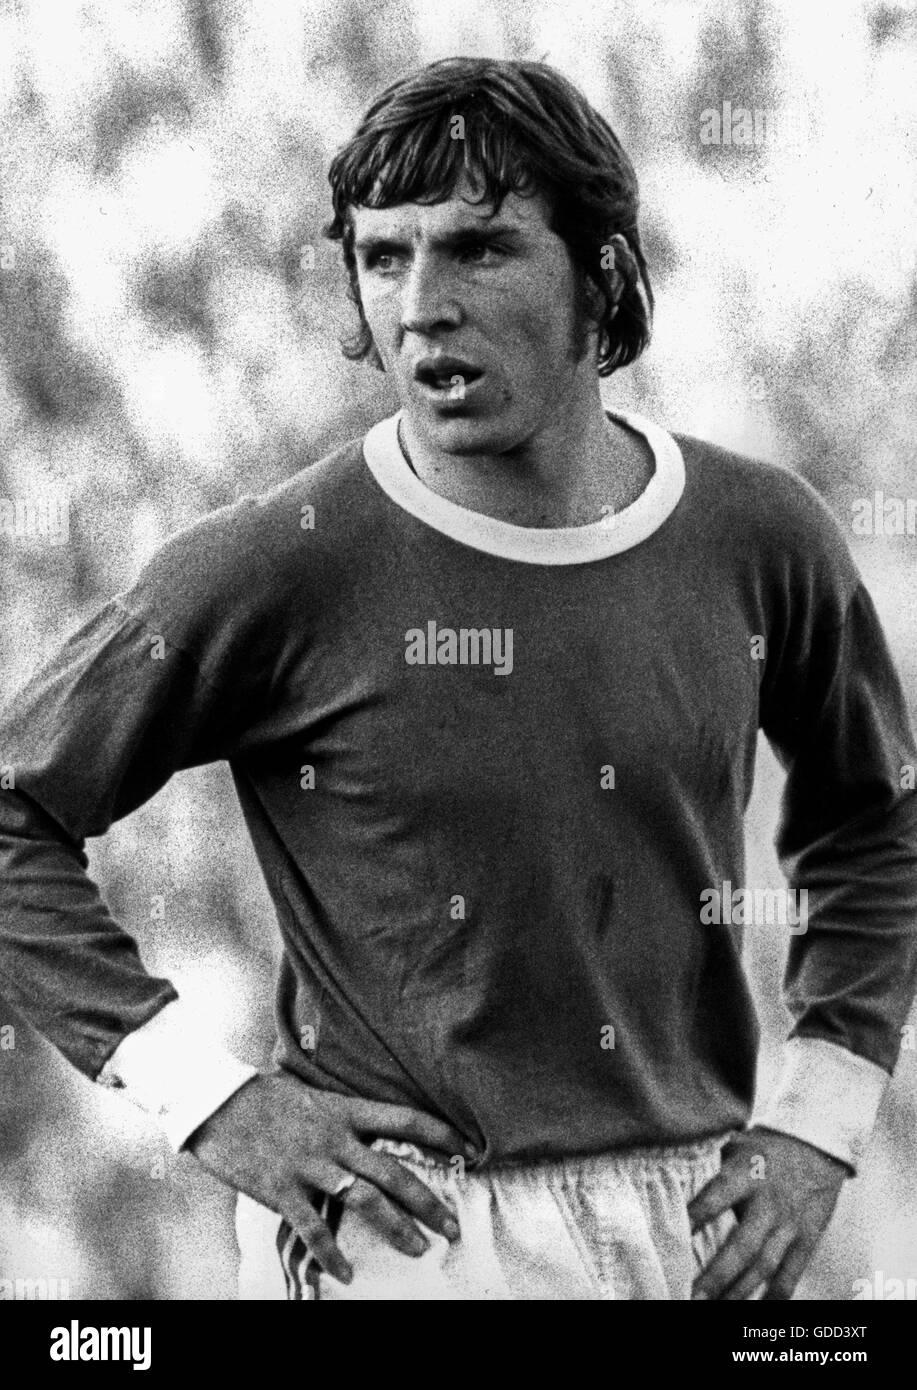 Fischer, Klaus, * 27.12.1949, German football player, striker for FC Schalke 04 1970 - 1981, half length, during - Stock Image